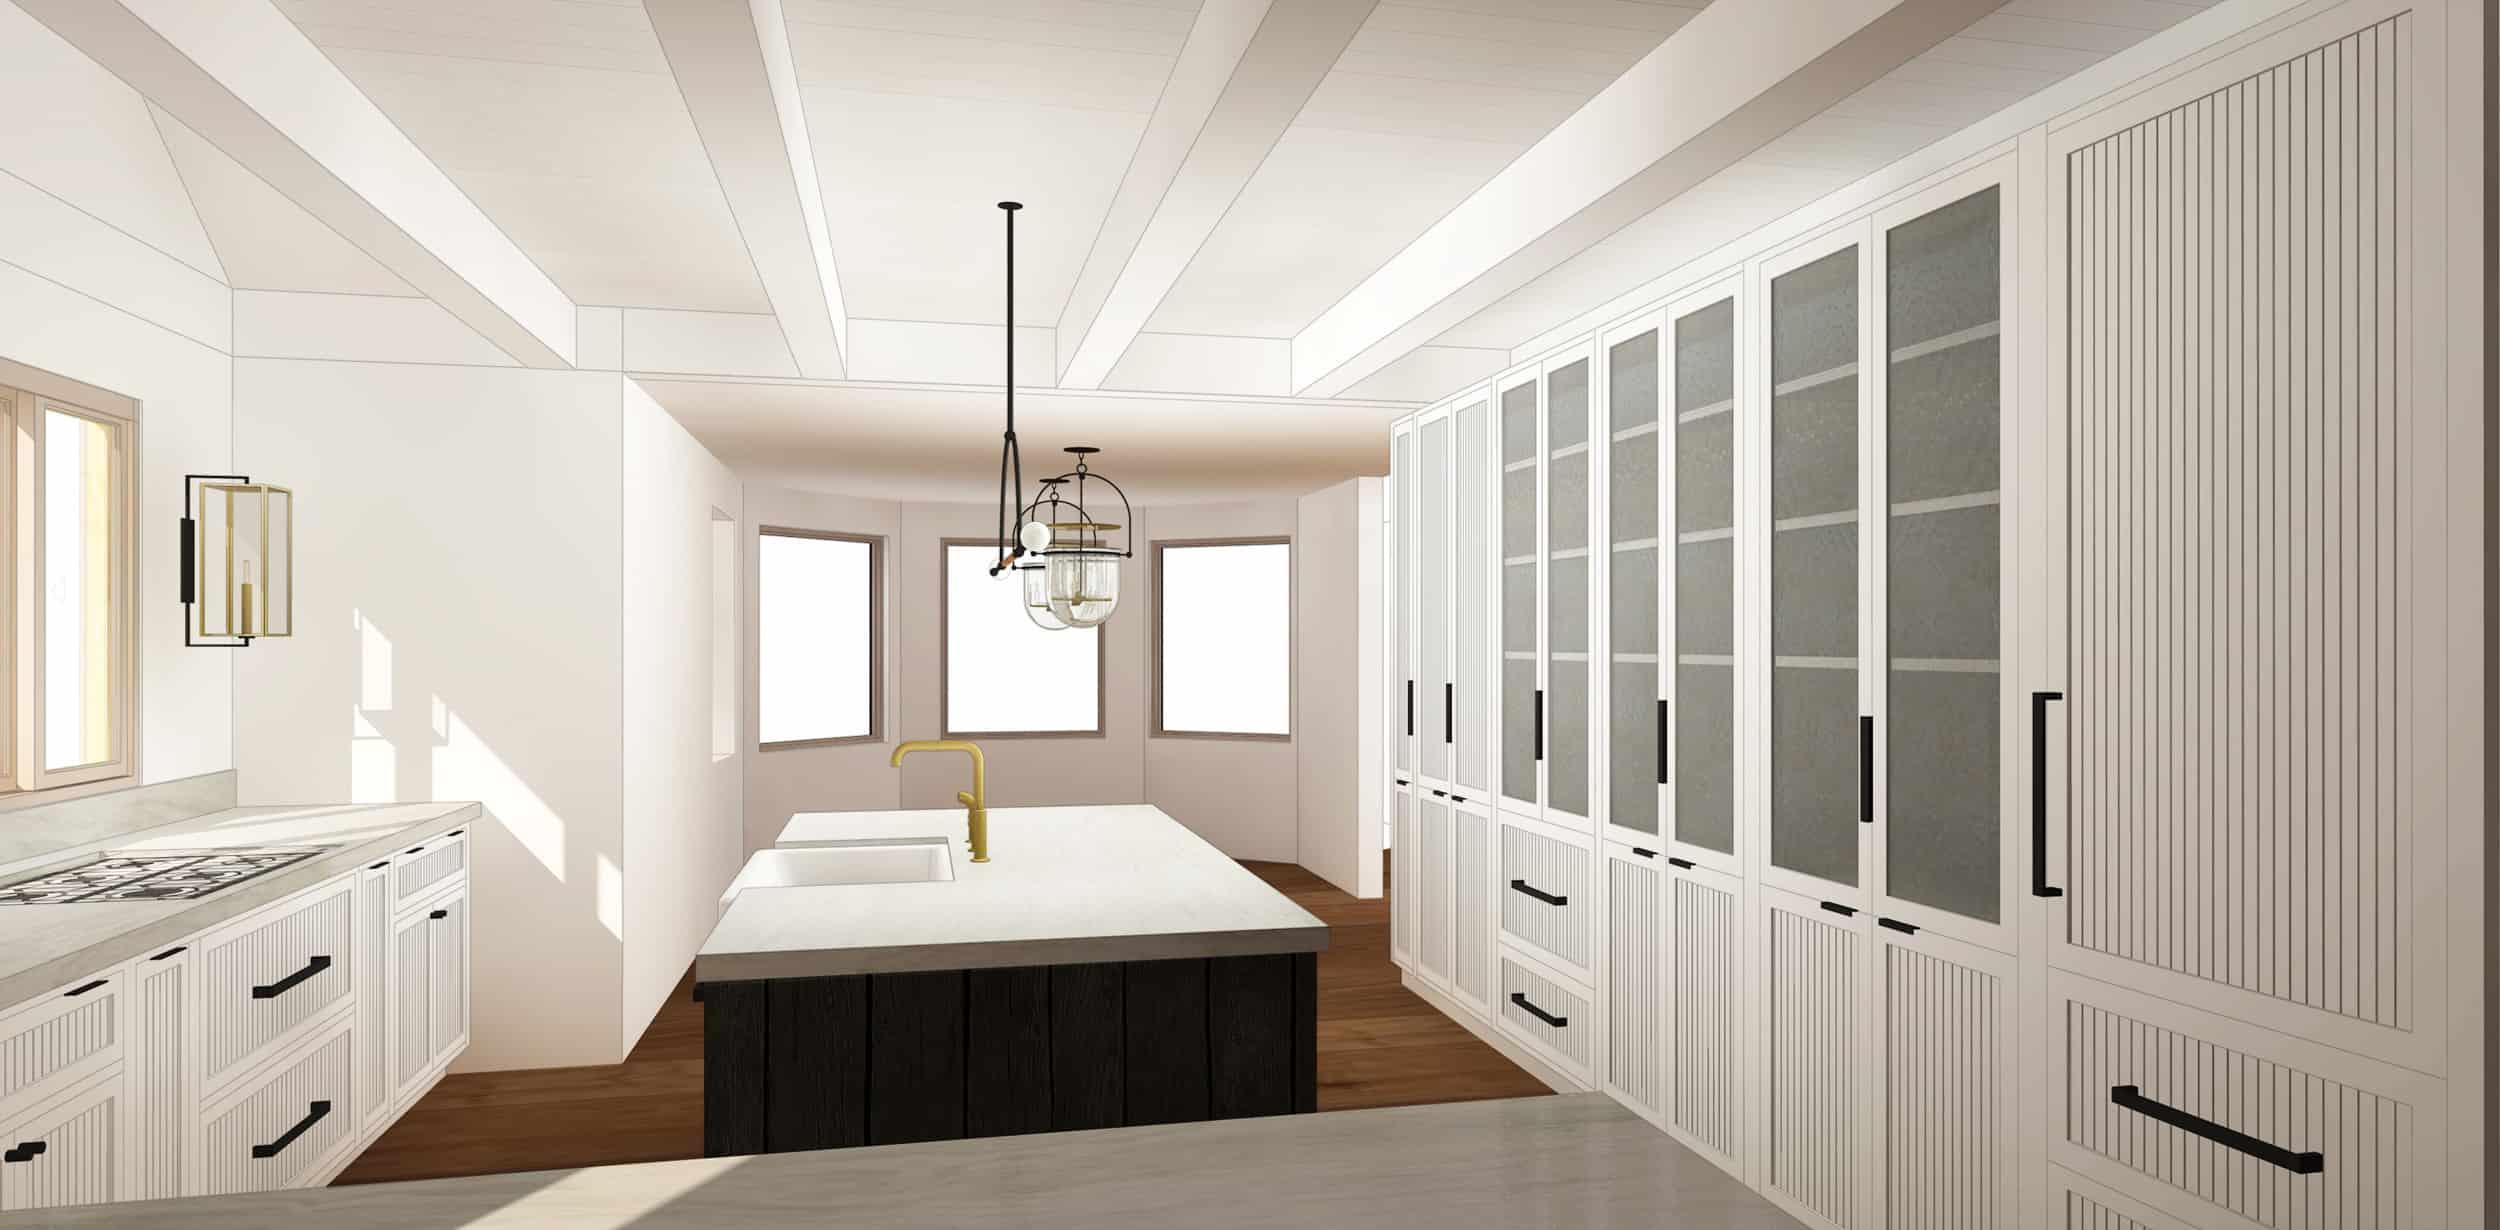 Emily Henderson Mountain House Kitchen Evolution Kitchensumnt Grooved Shaker Glass 01 Final